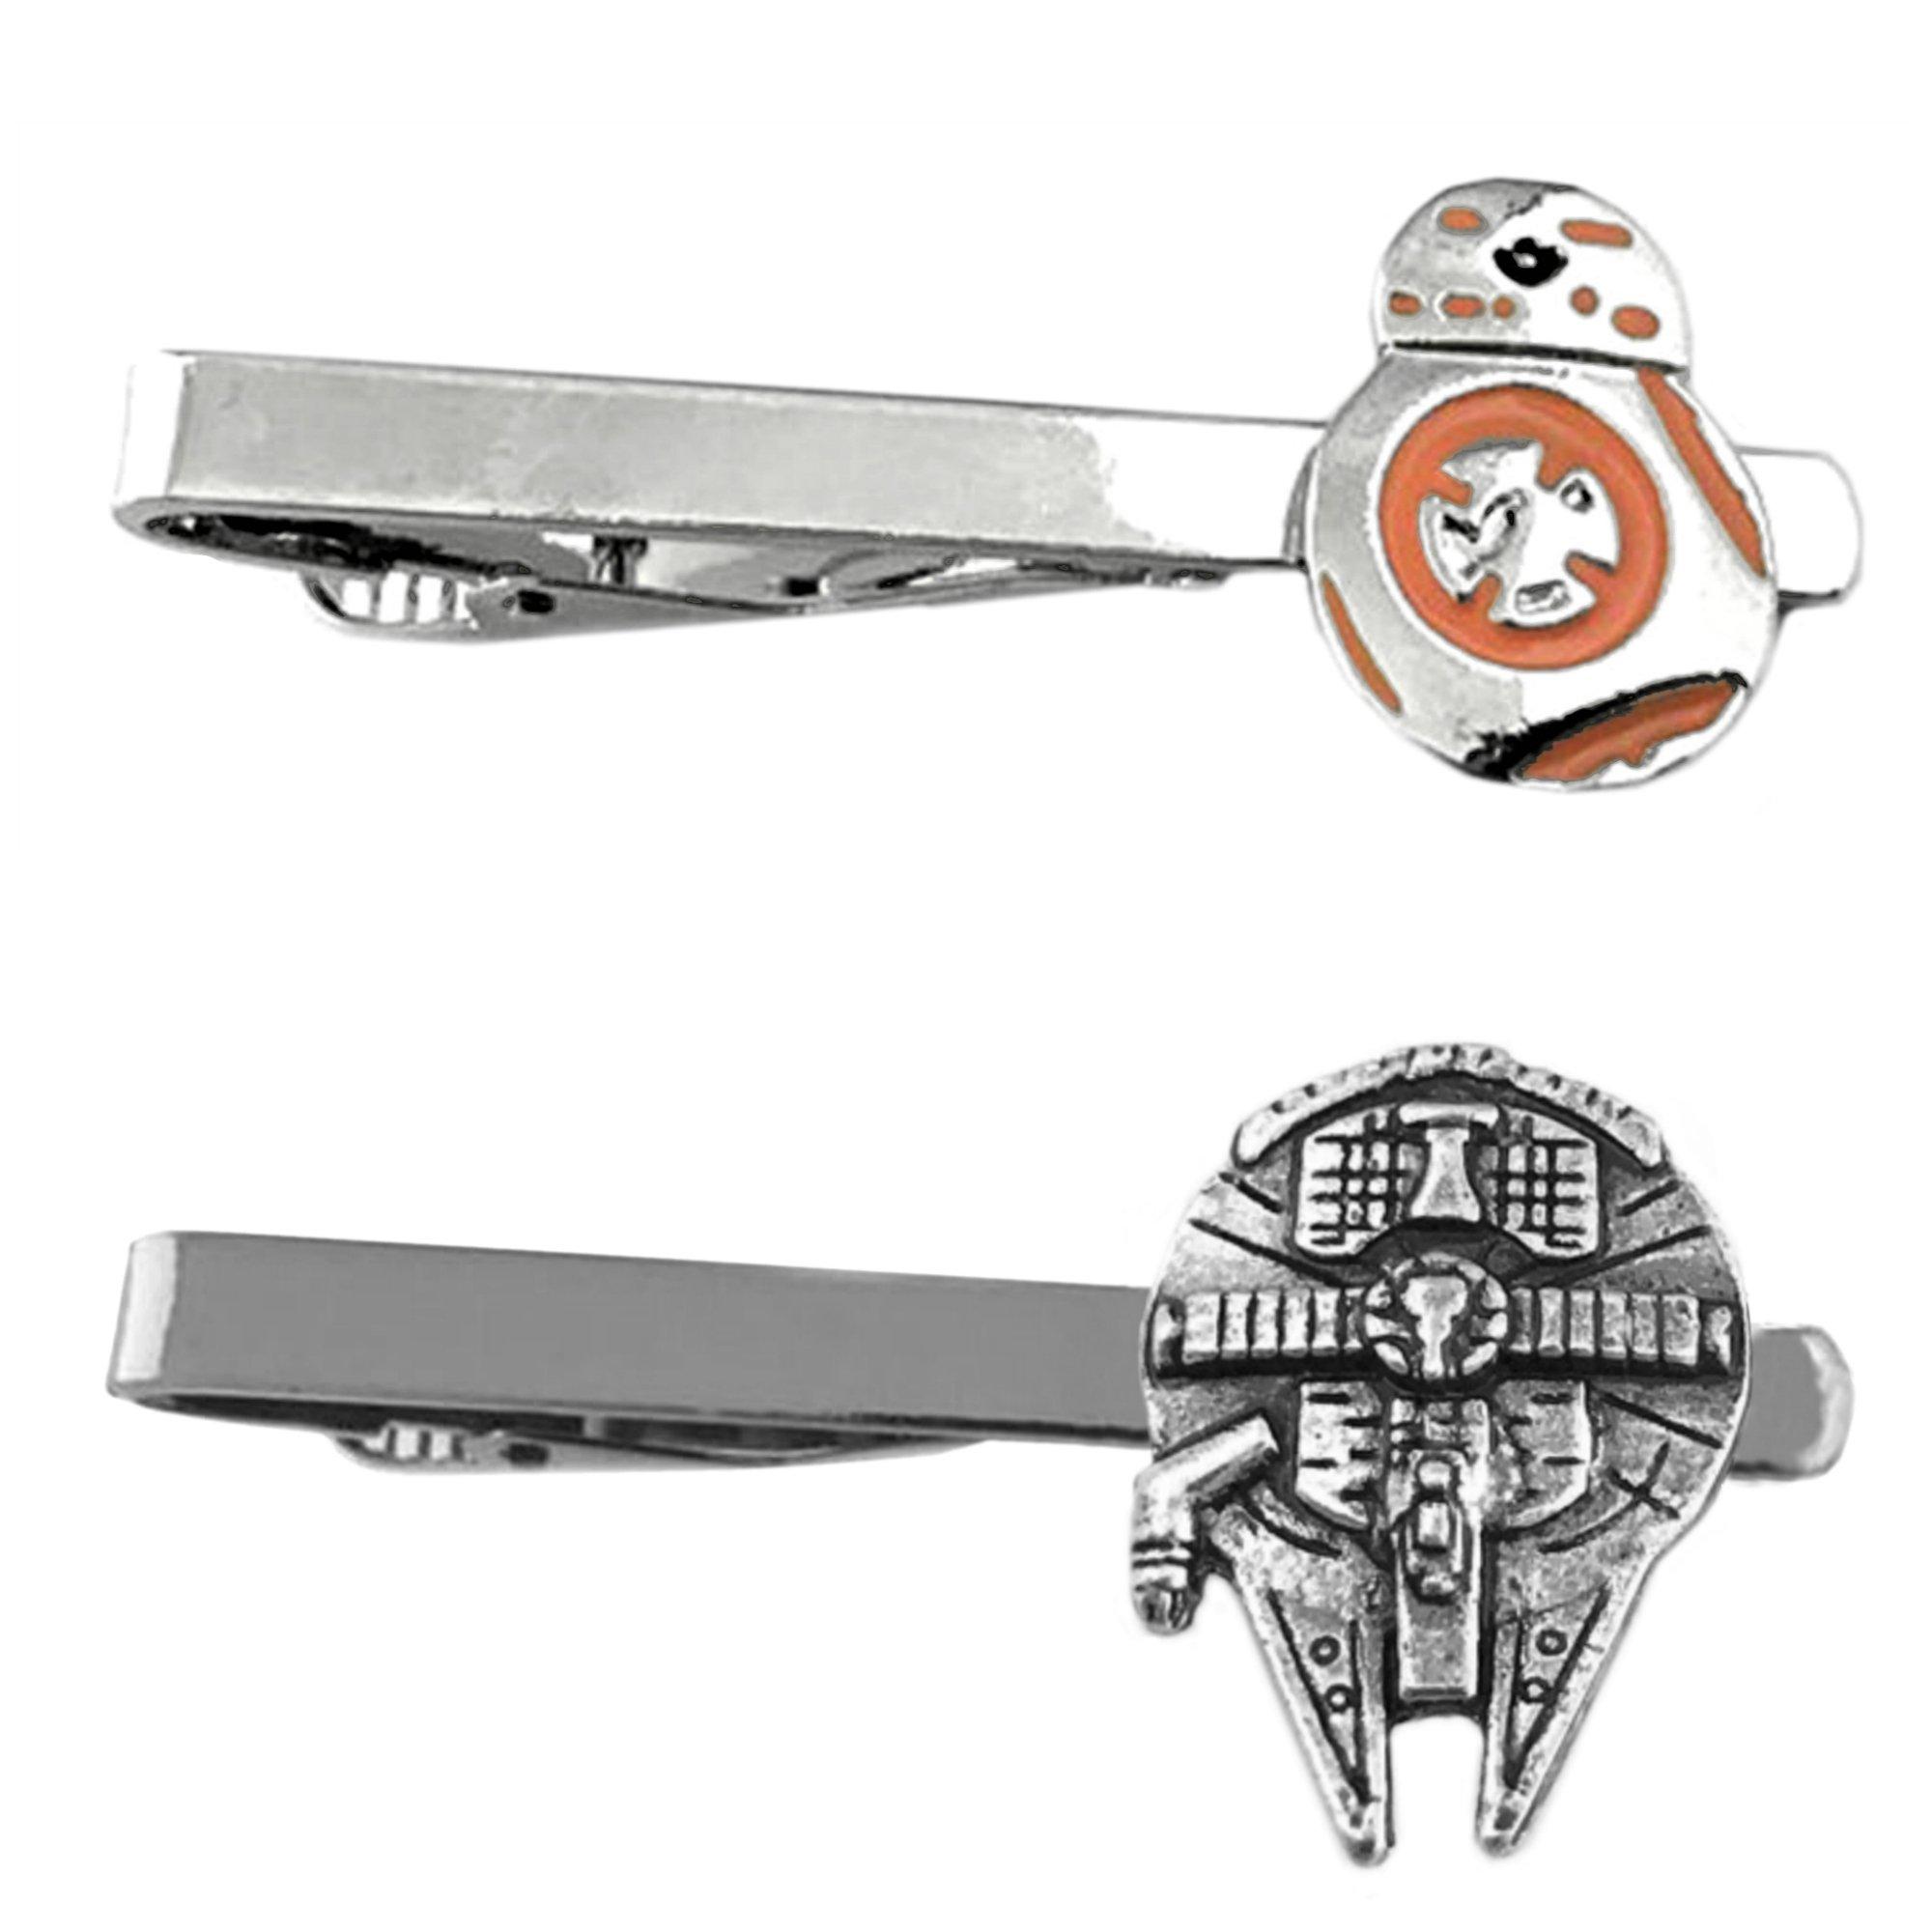 Outlander Star Wars - BB-8 Silver Metal & Millenium Falcon - Tiebar Tie Clasp Set of 2 Wedding Superhero Logo w/Gift Box